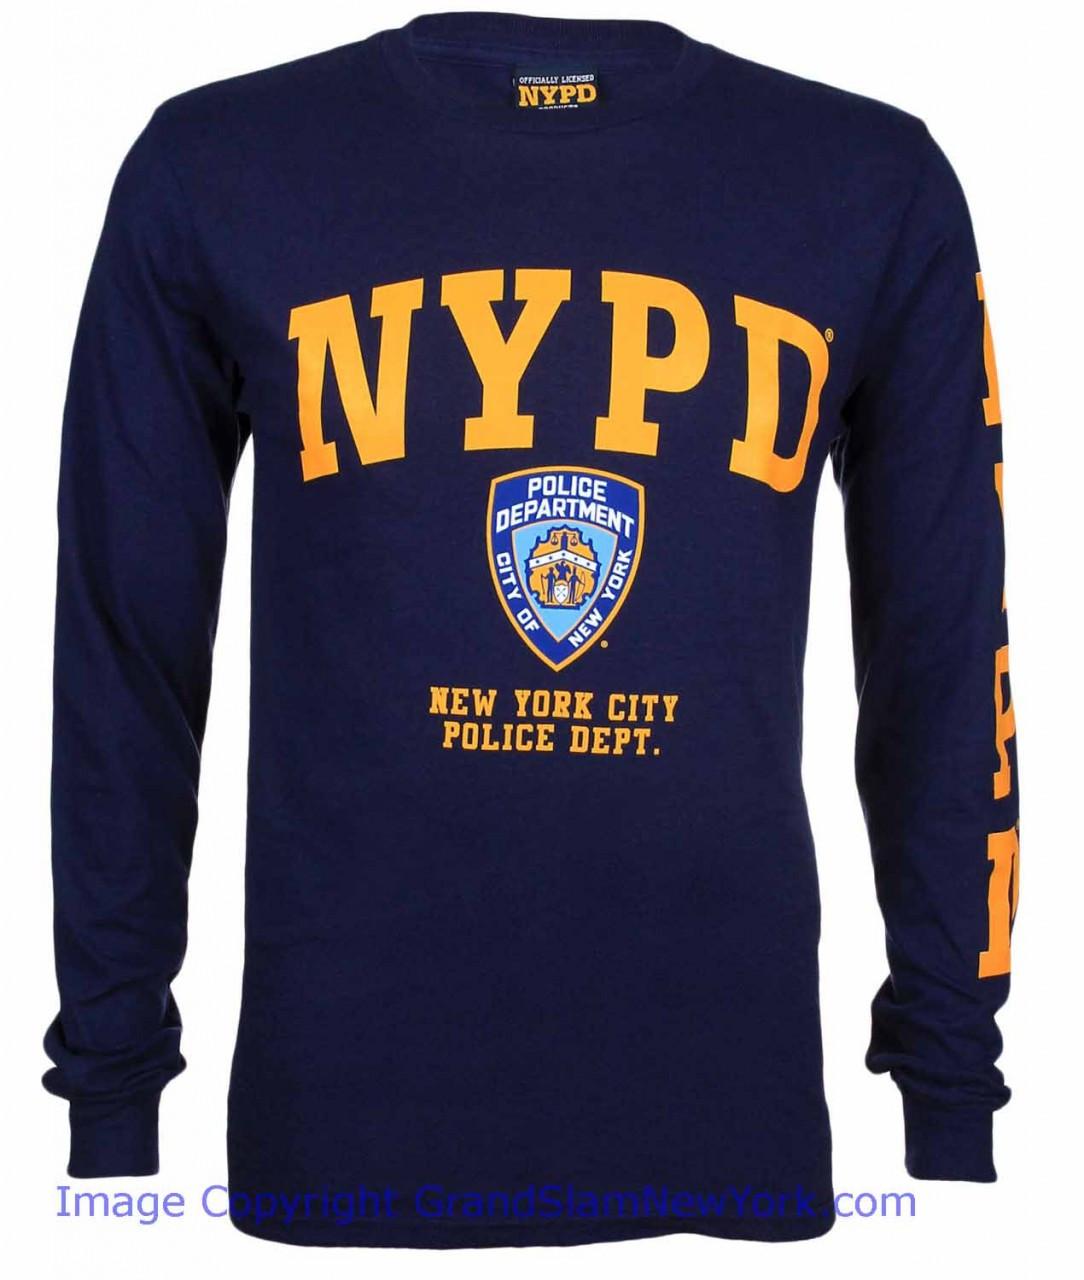 Nypd T Shirts Nypd Shirts Nypd Polo Shirts